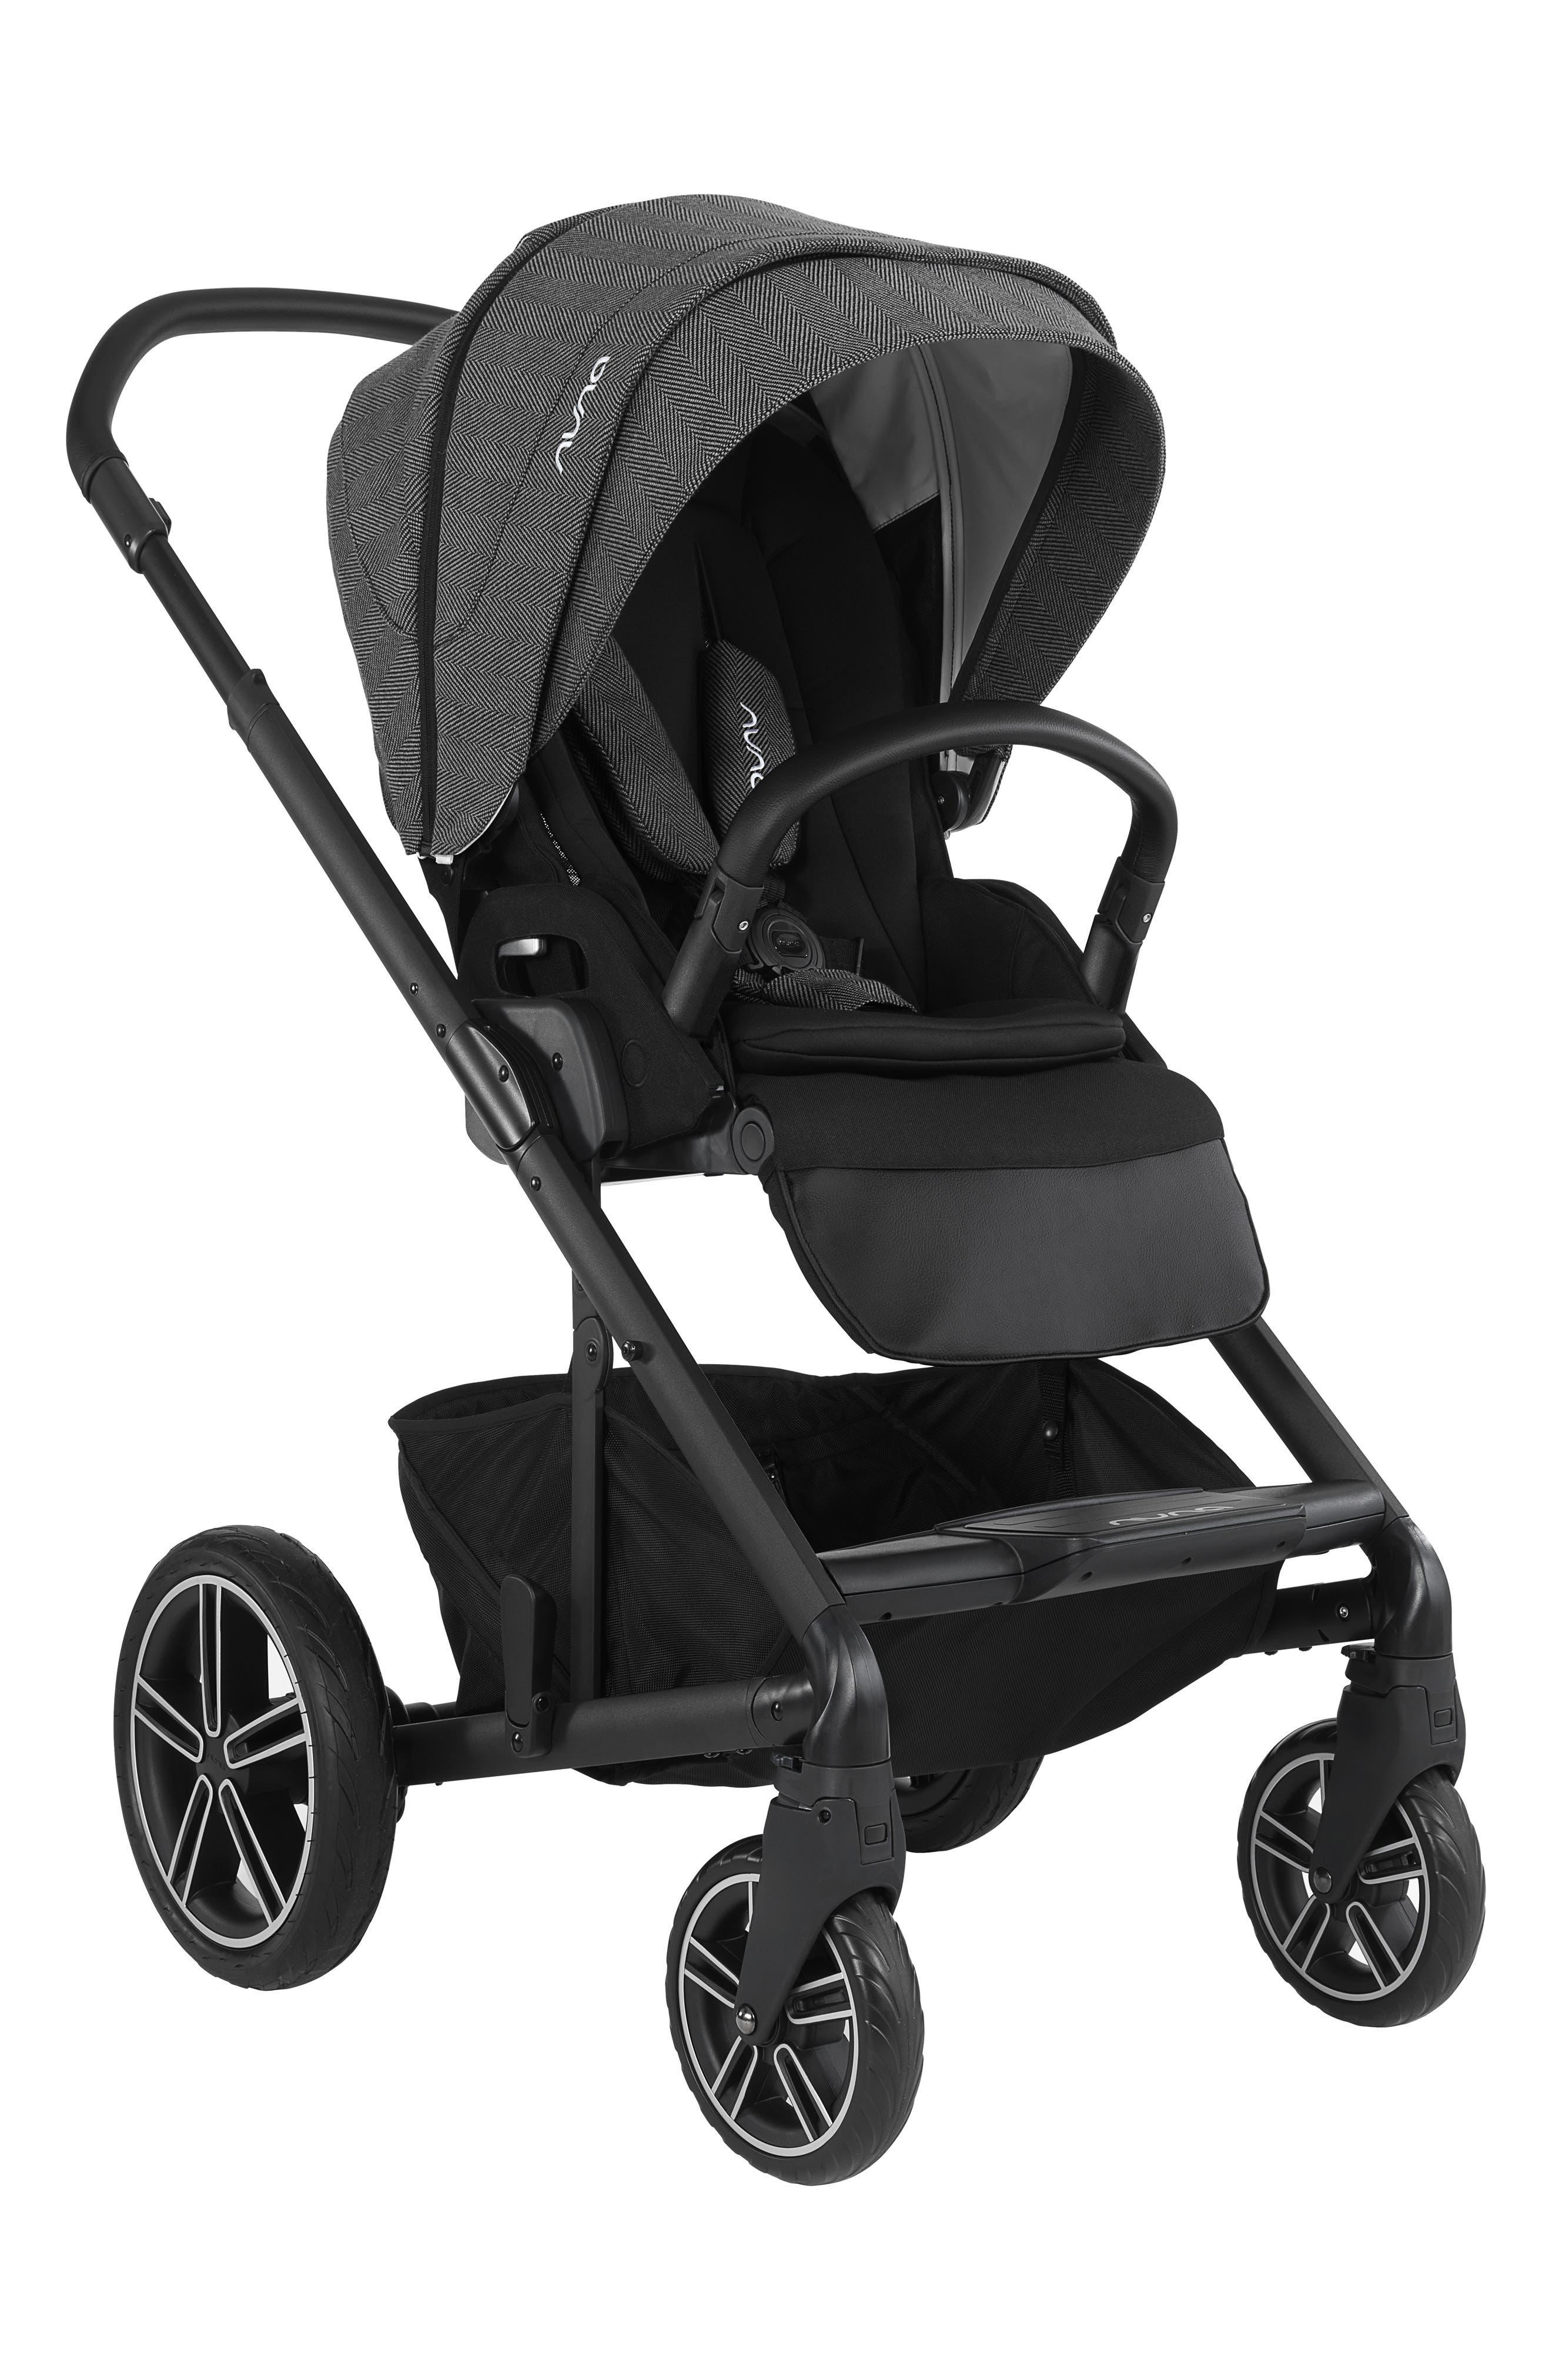 2019 MIXX<sup>™</sup> Stroller & PIPA<sup>™</sup> Lite LX Infant Car Seat Set Travel System,                             Alternate thumbnail 10, color,                             VERONA CAVIAR